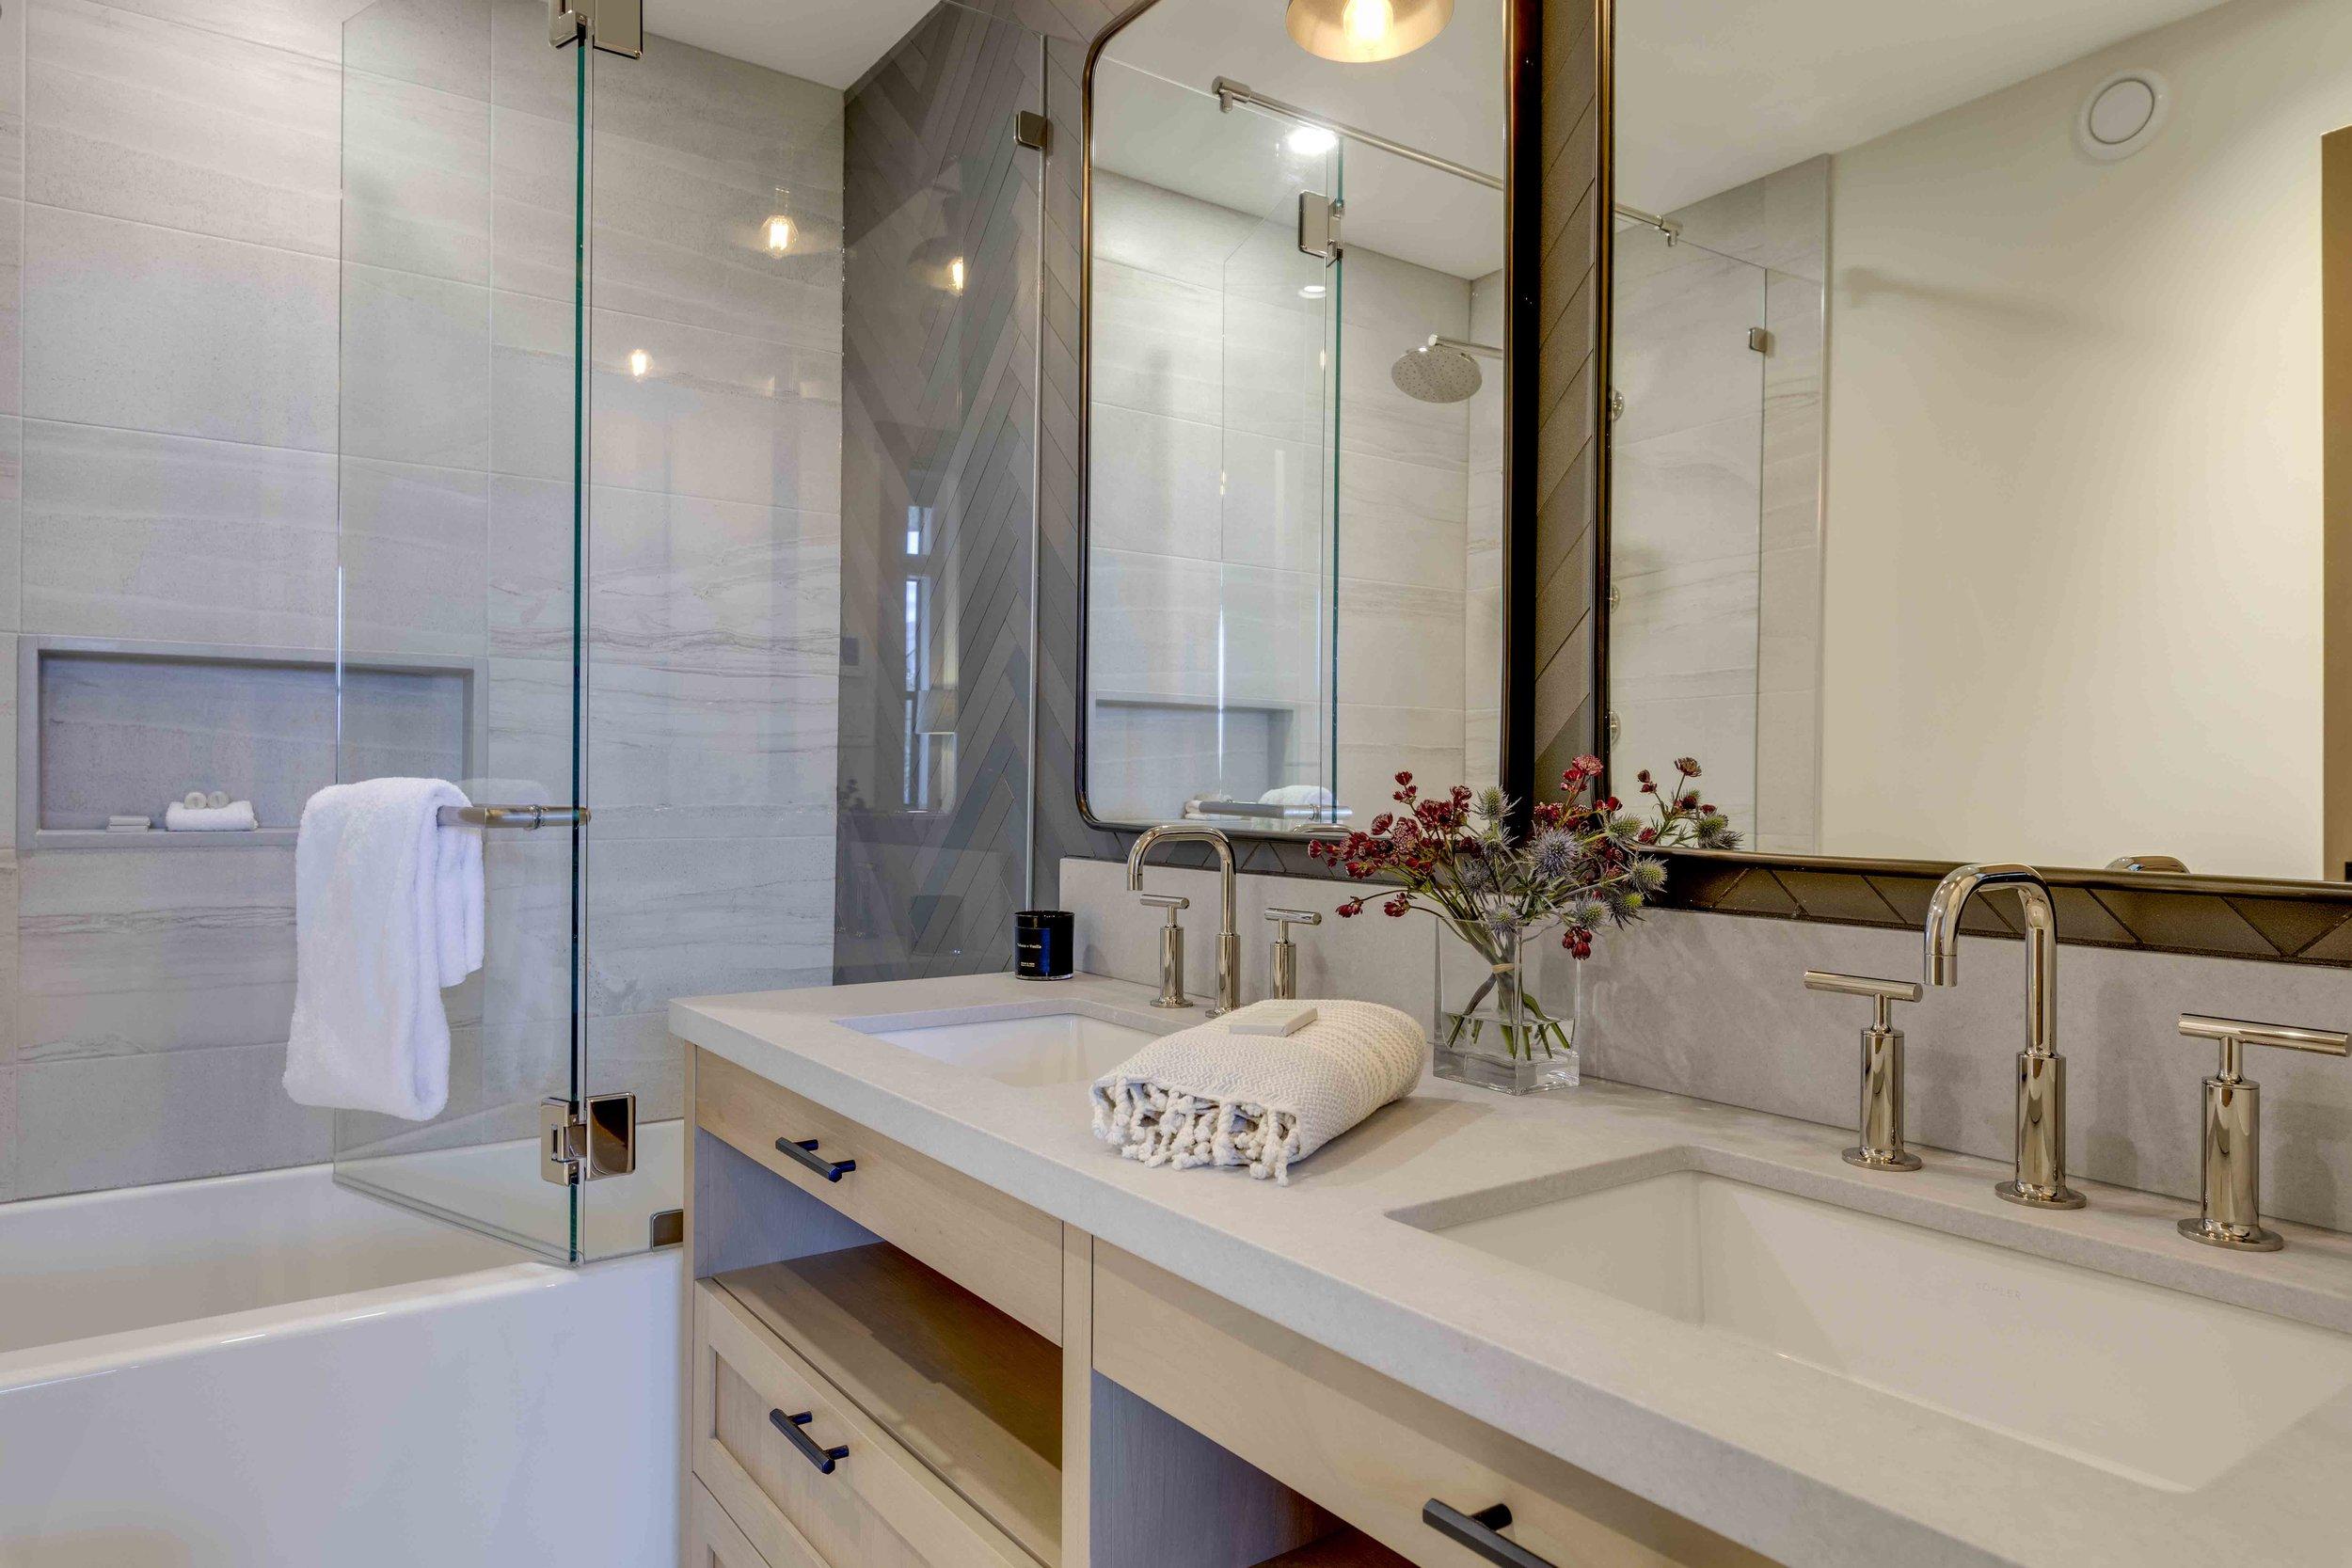 BathroomRenovations -